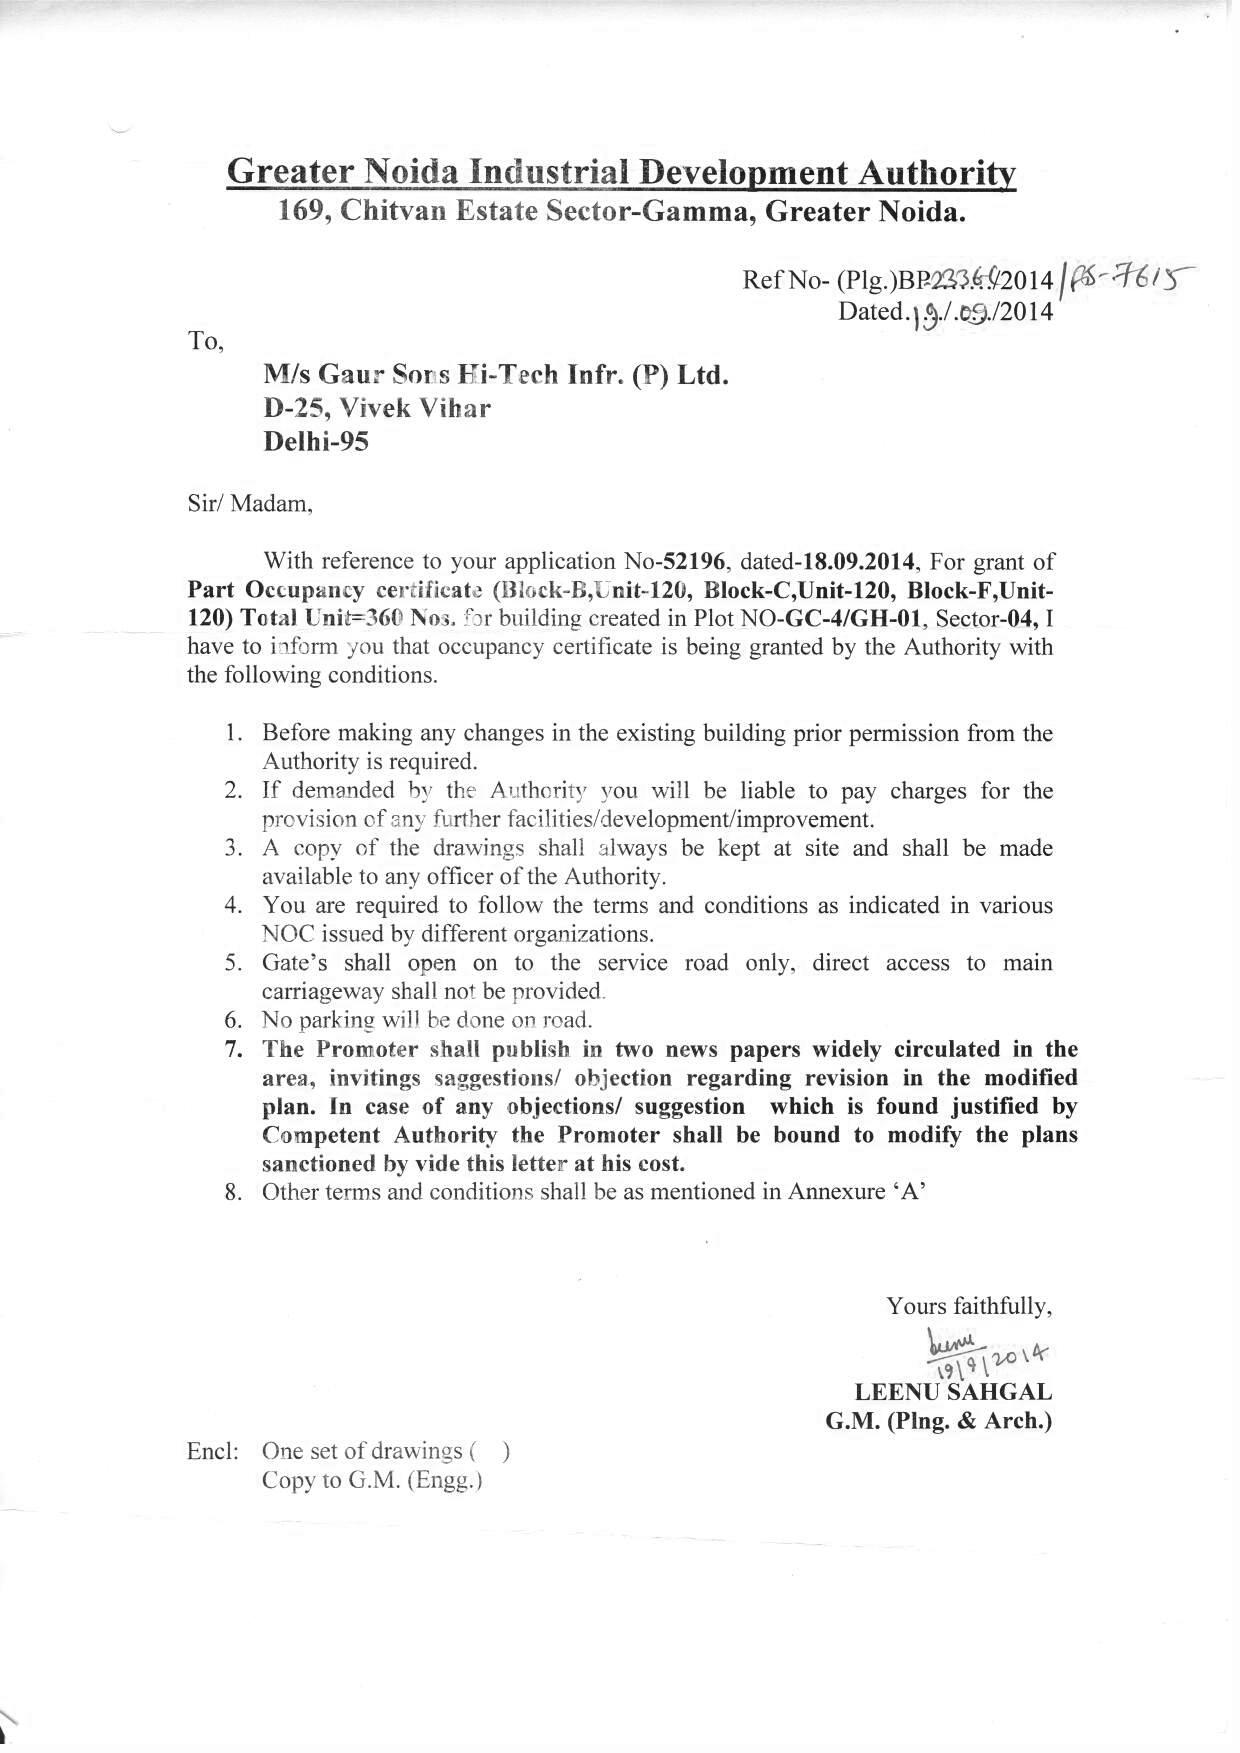 Gaur city gc 4 sector 4 greater noida sanction letter 1852 kb mitanshu Choice Image